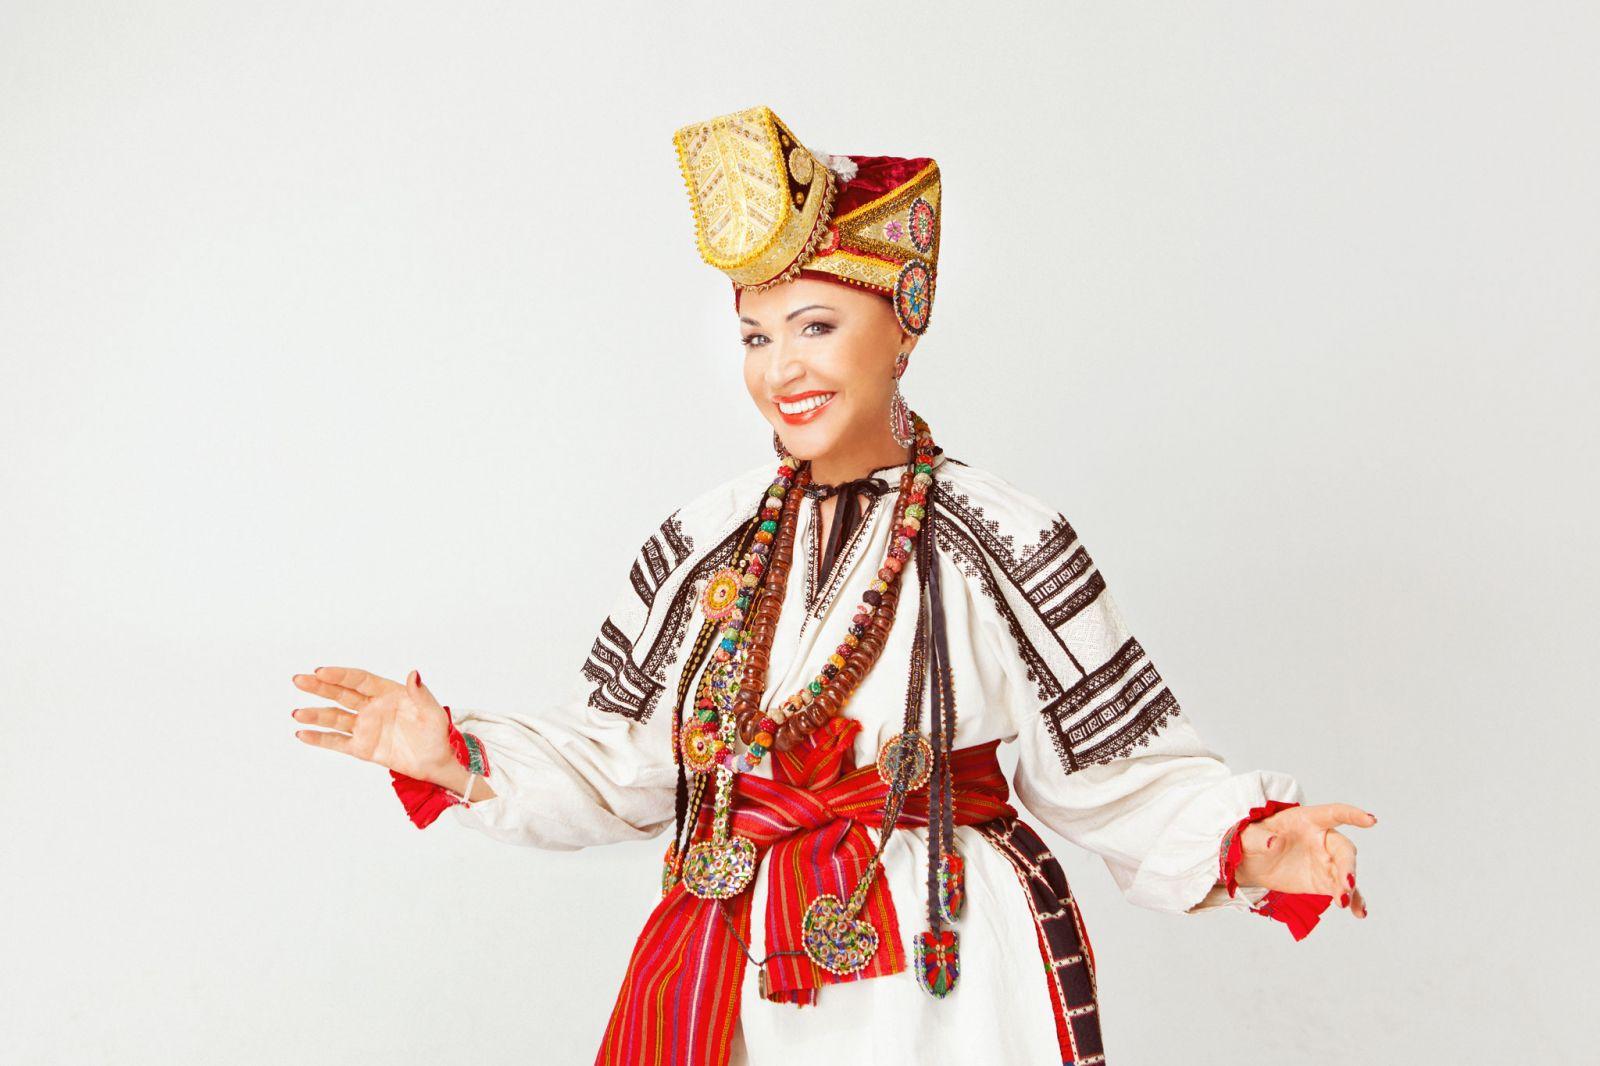 Надежда Бабкина - фото №1